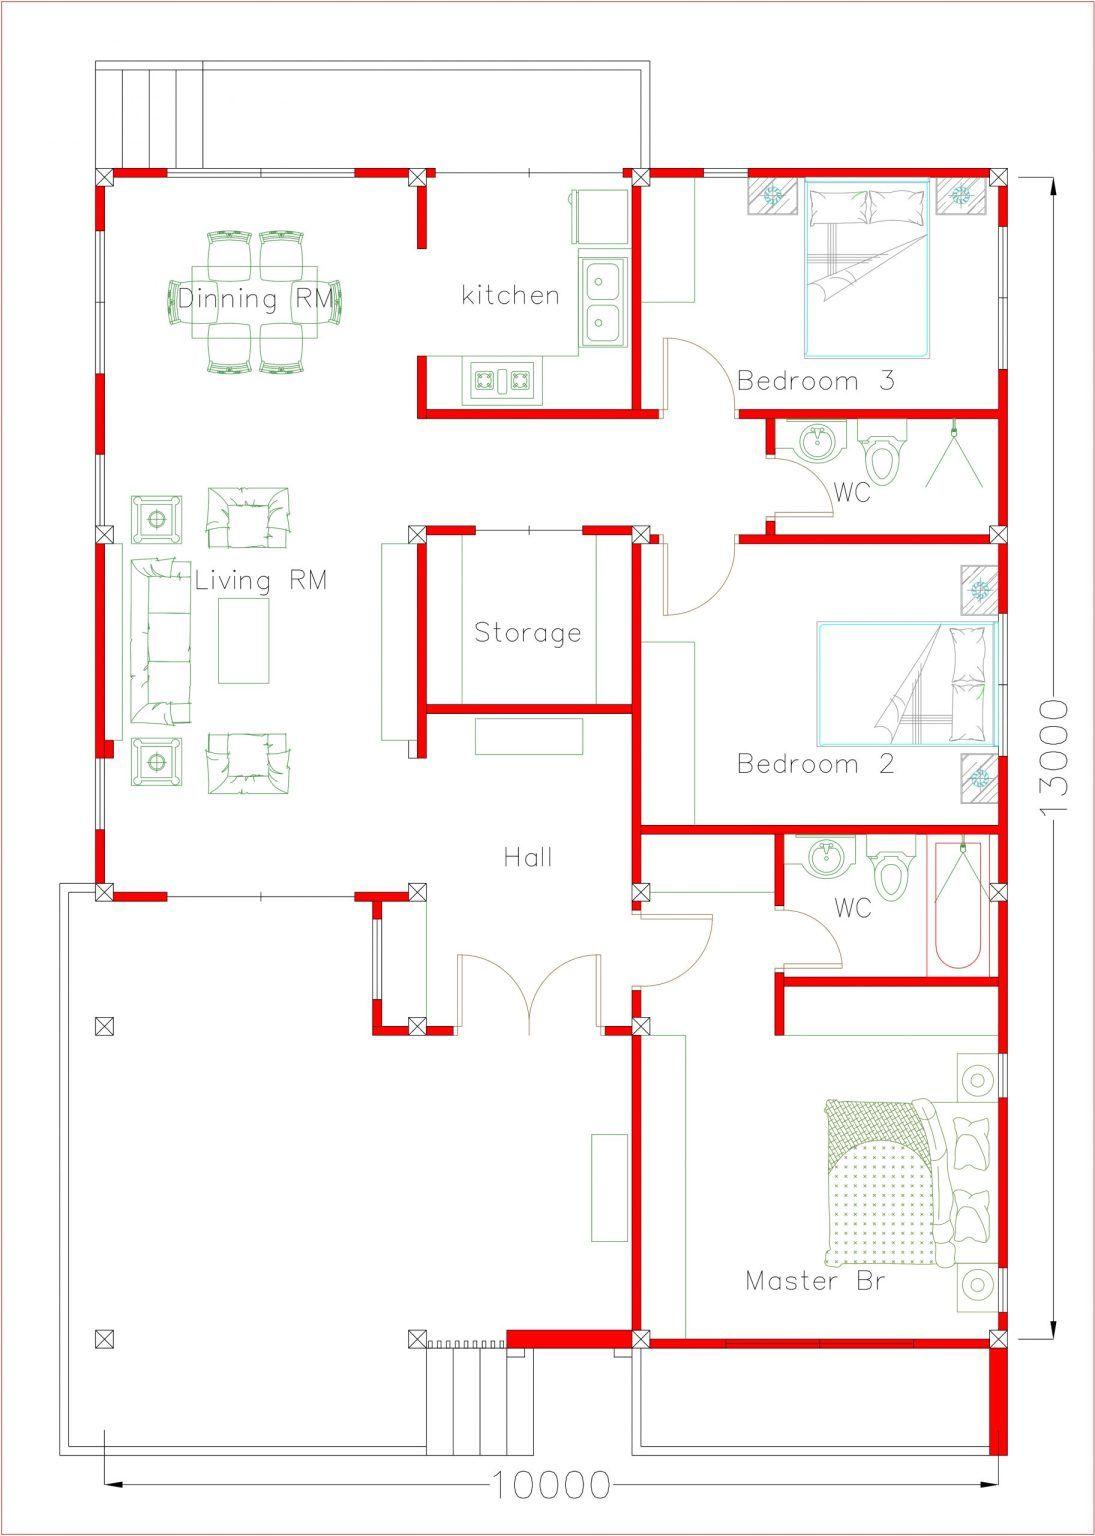 Modern Ranch House Plans 10x13 Meters 33x43 Feet Pro Home Decorz In 2020 Bedroom House Plans Bungalow Floor Plans Unique House Plans